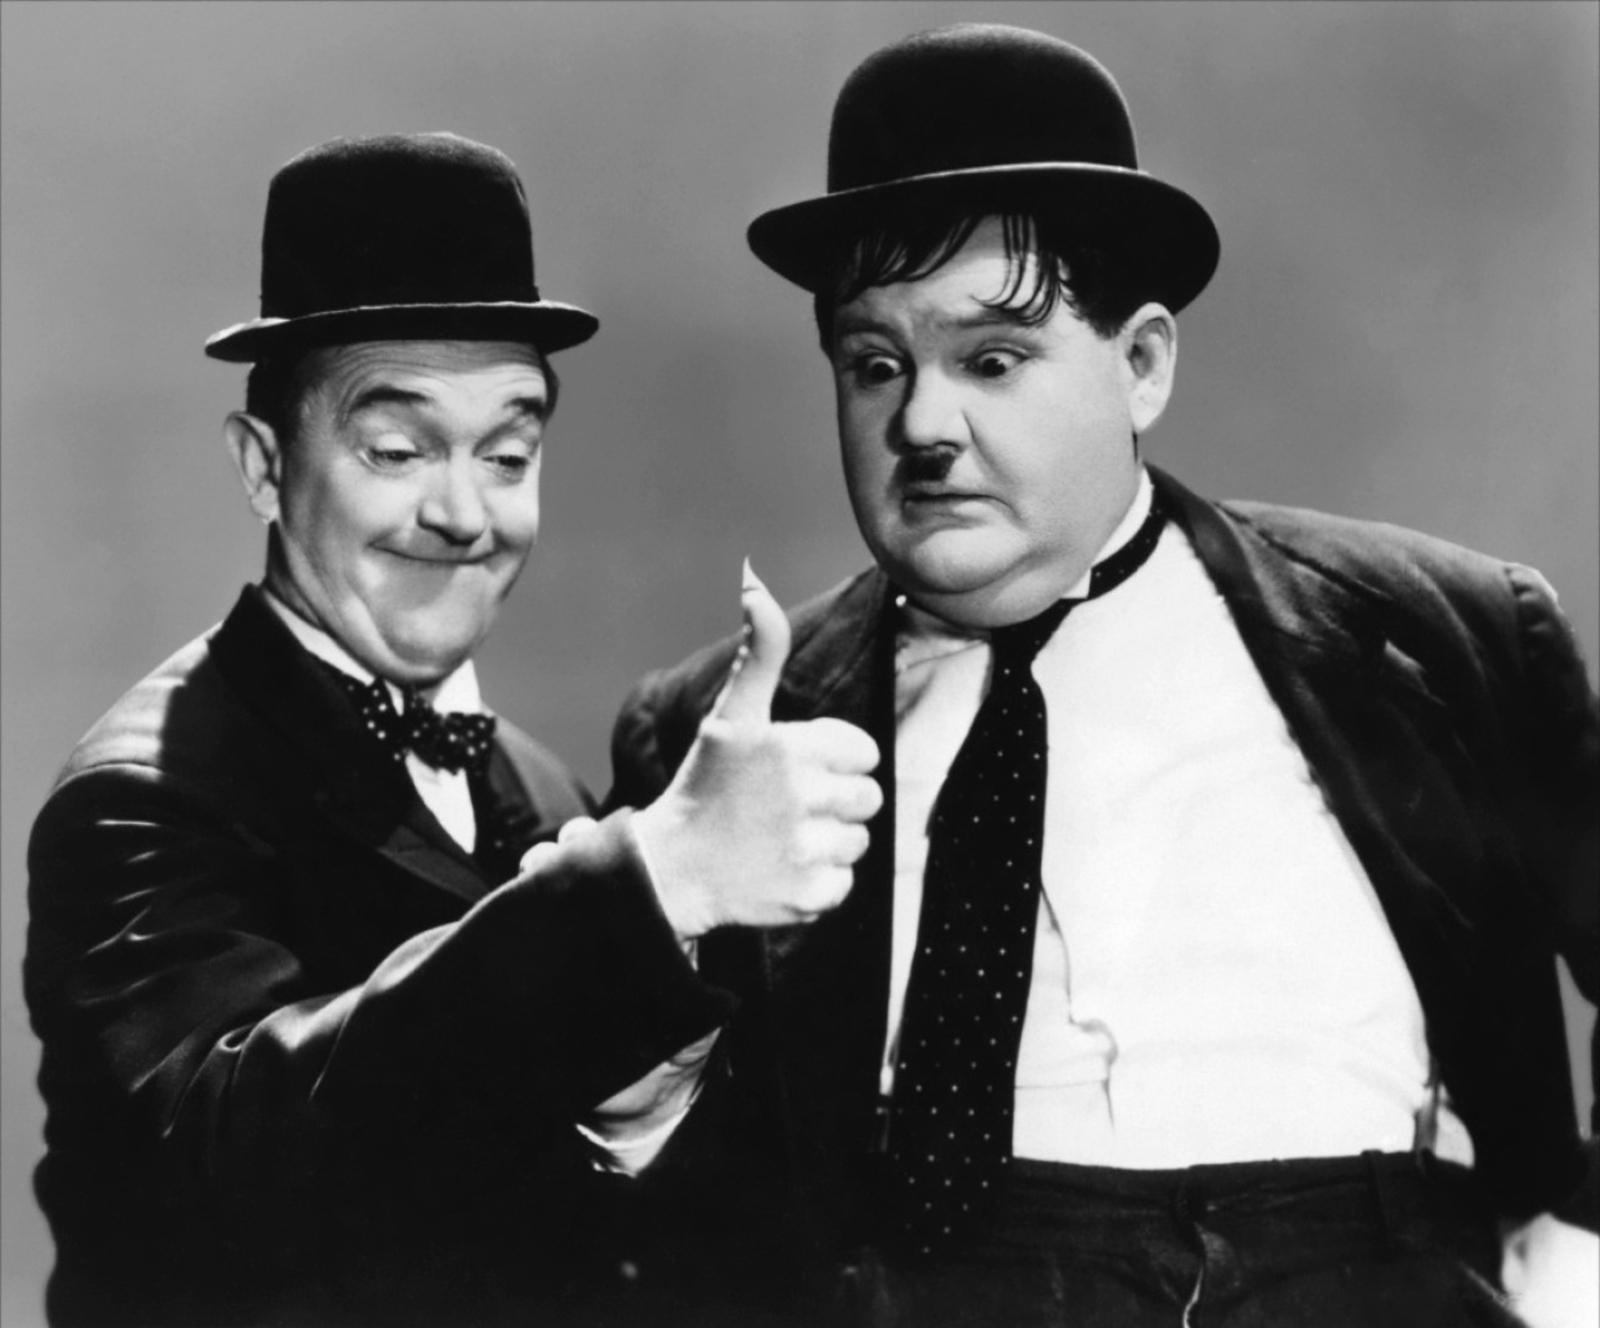 Annex - Laurel & Hardy (Way Out West)_01.jpg